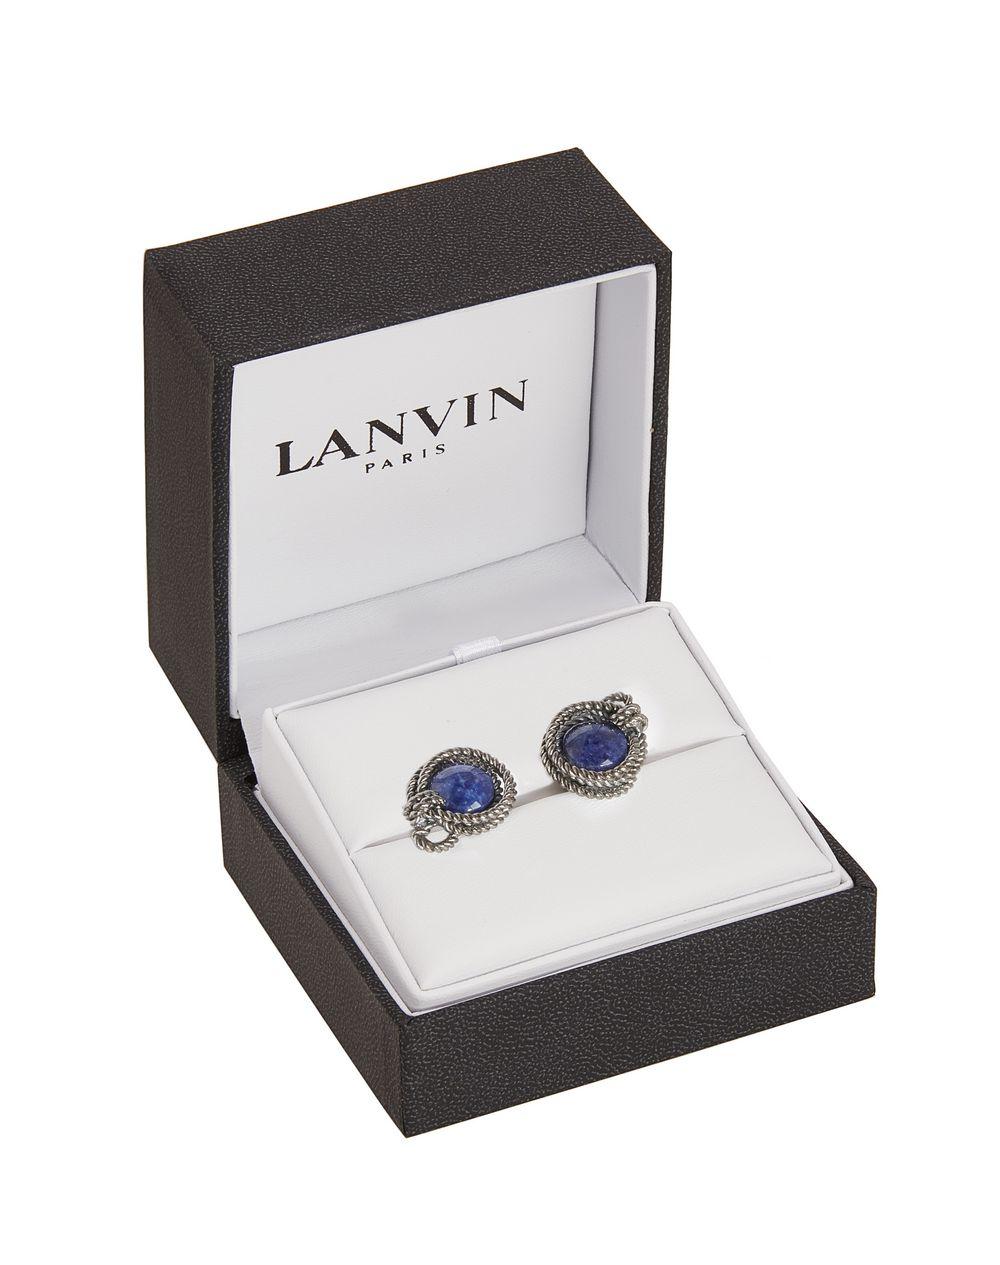 Ruthenium-plated metal cuff links - Lanvin